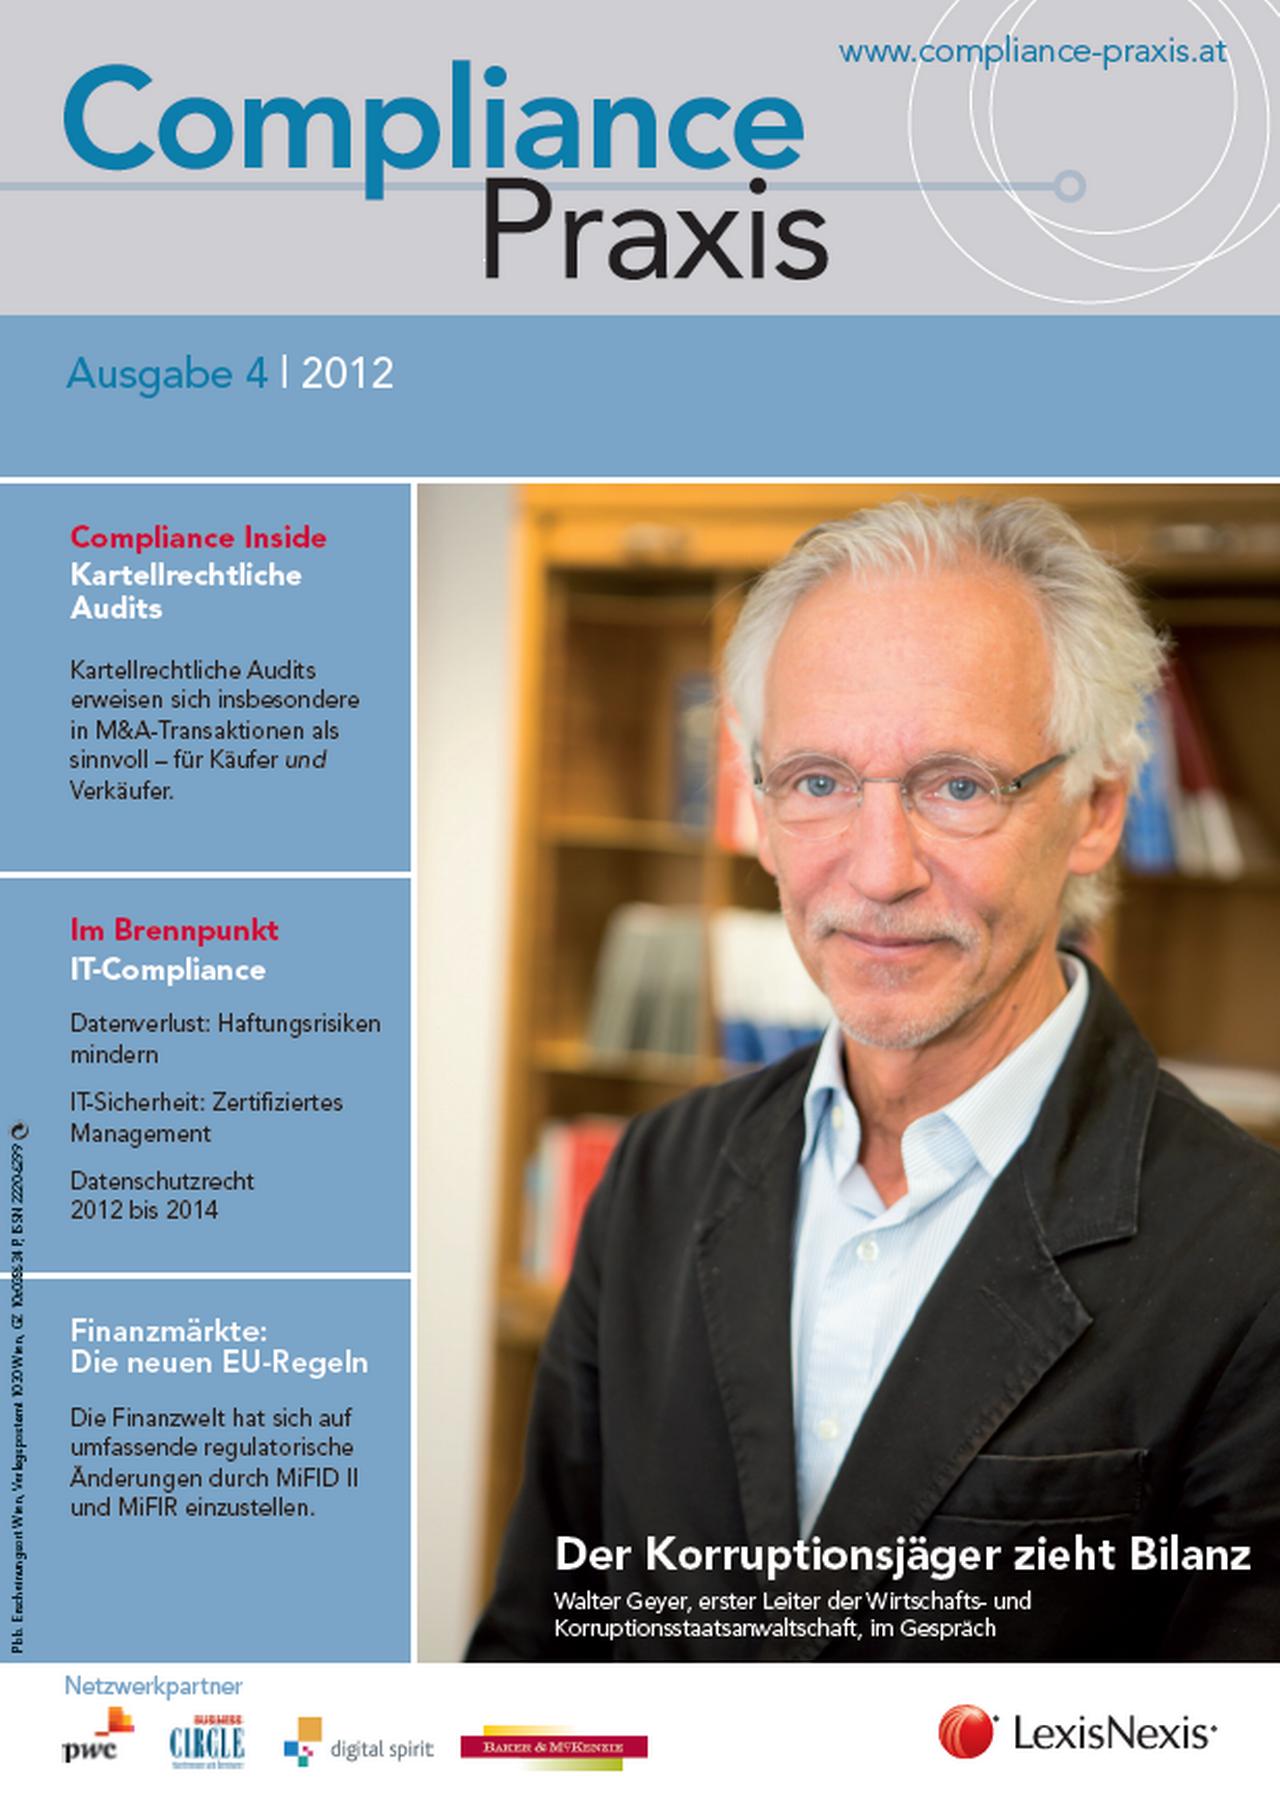 Cover von Compliance Praxis Ausgabe 4/2012, © LexisNexis